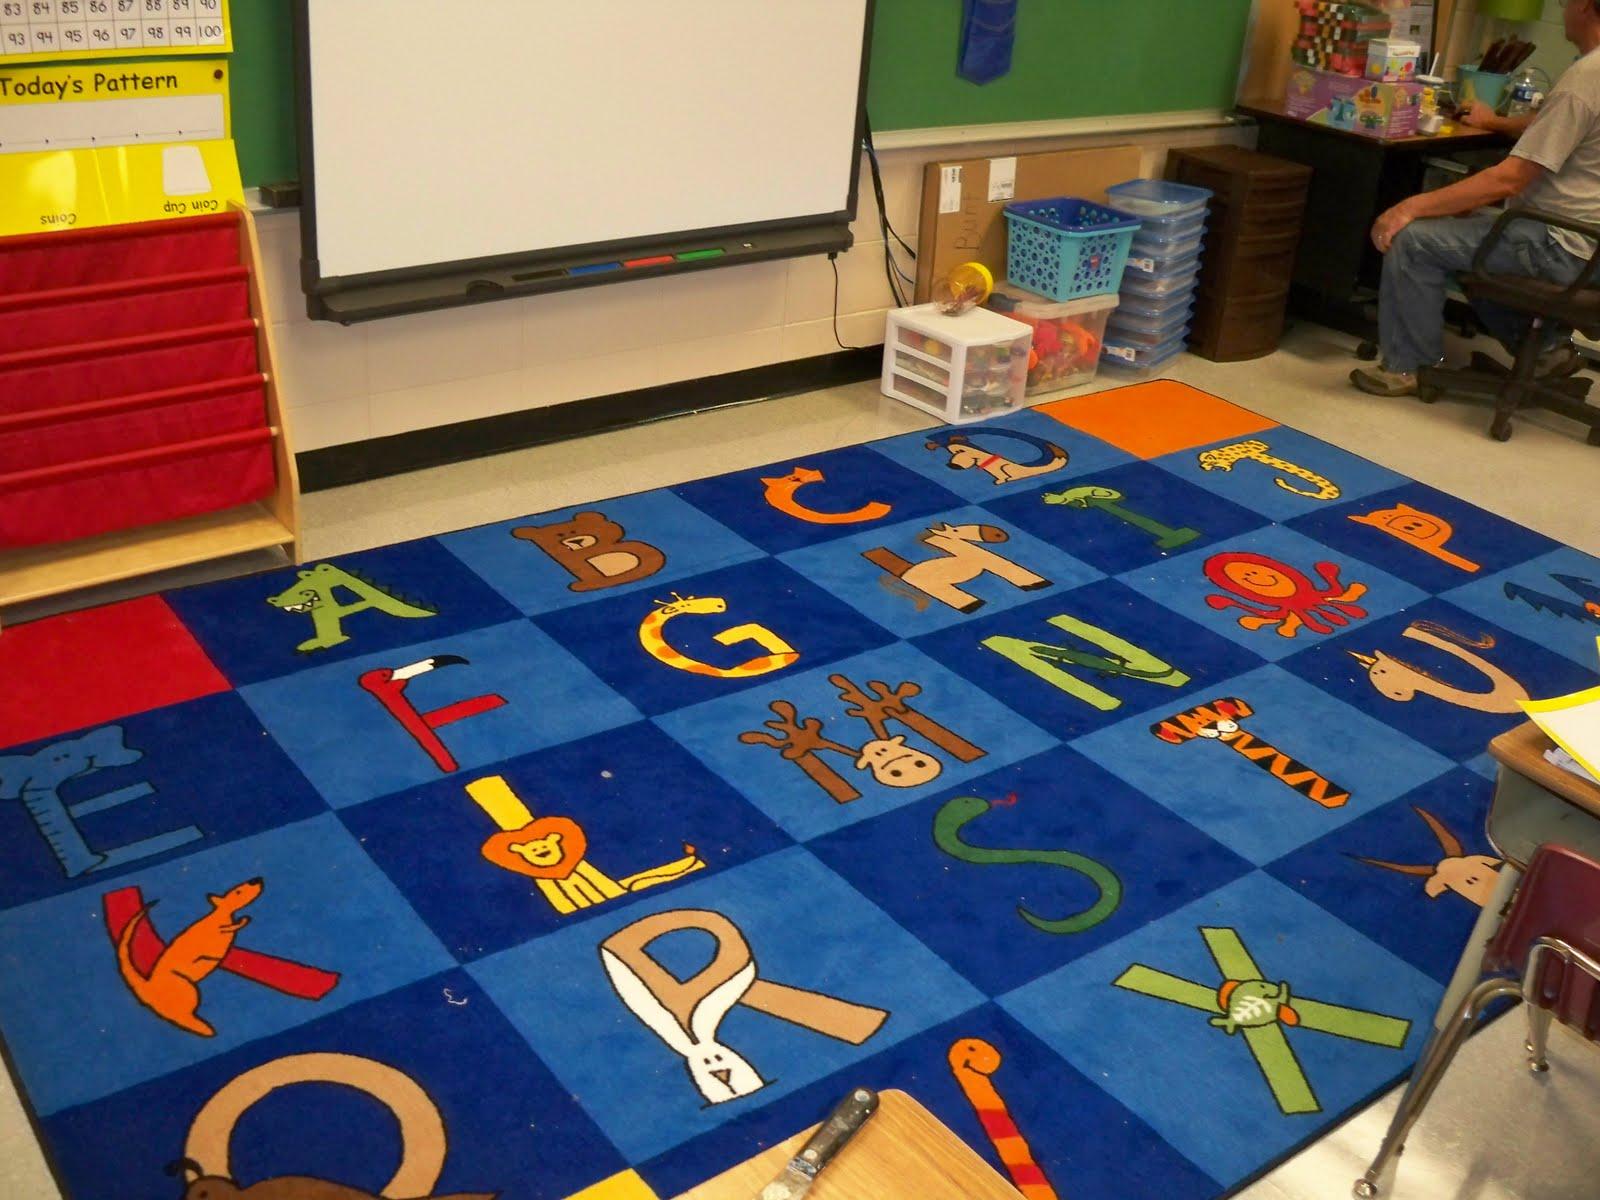 Classroom Rug Clip Art | www.imgkid.com - The Image Kid ...